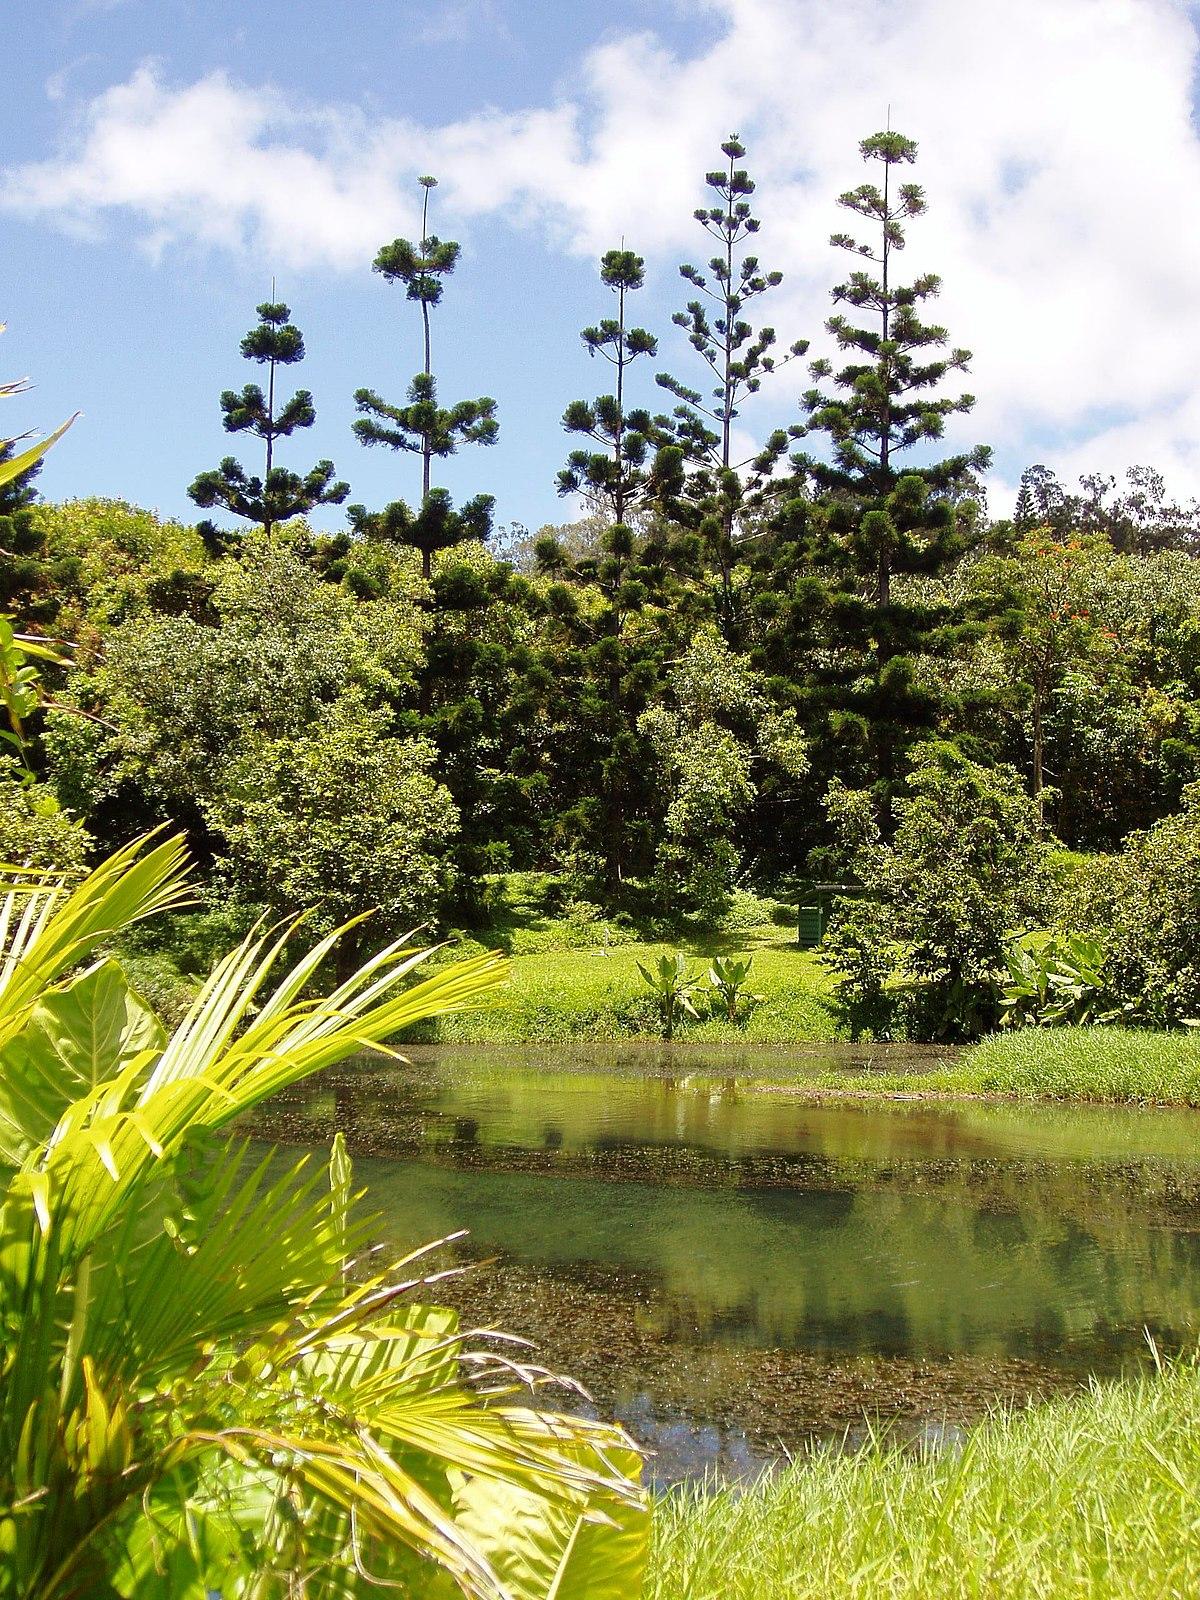 Pictures Of Garden Pathways And Walkways: Hoʻomaluhia Botanical Garden